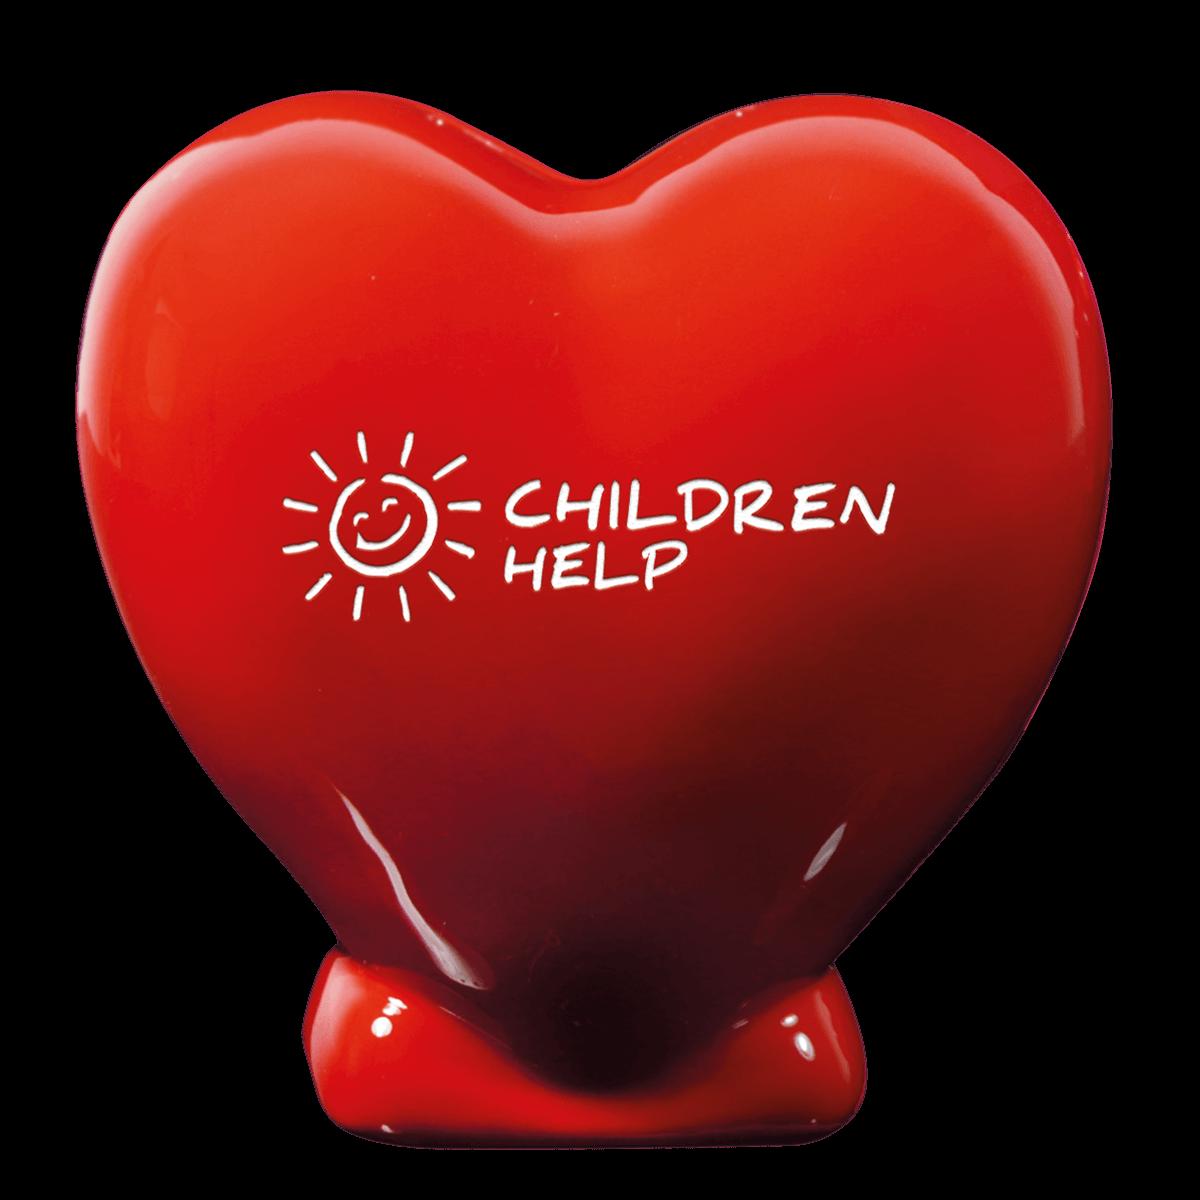 Venedig_P2_children-help_frei_1200px